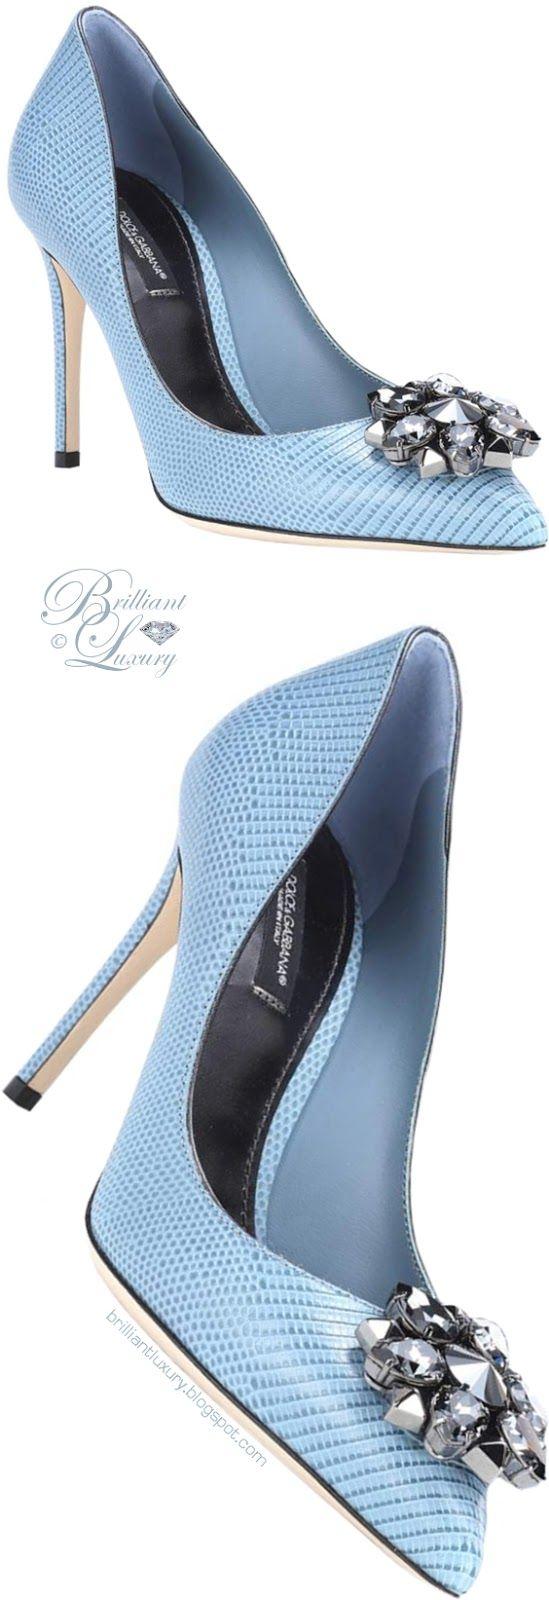 Brilliant Luxury ♦ Dolce & Gabbana Bellucci Embellished Leather Pumps